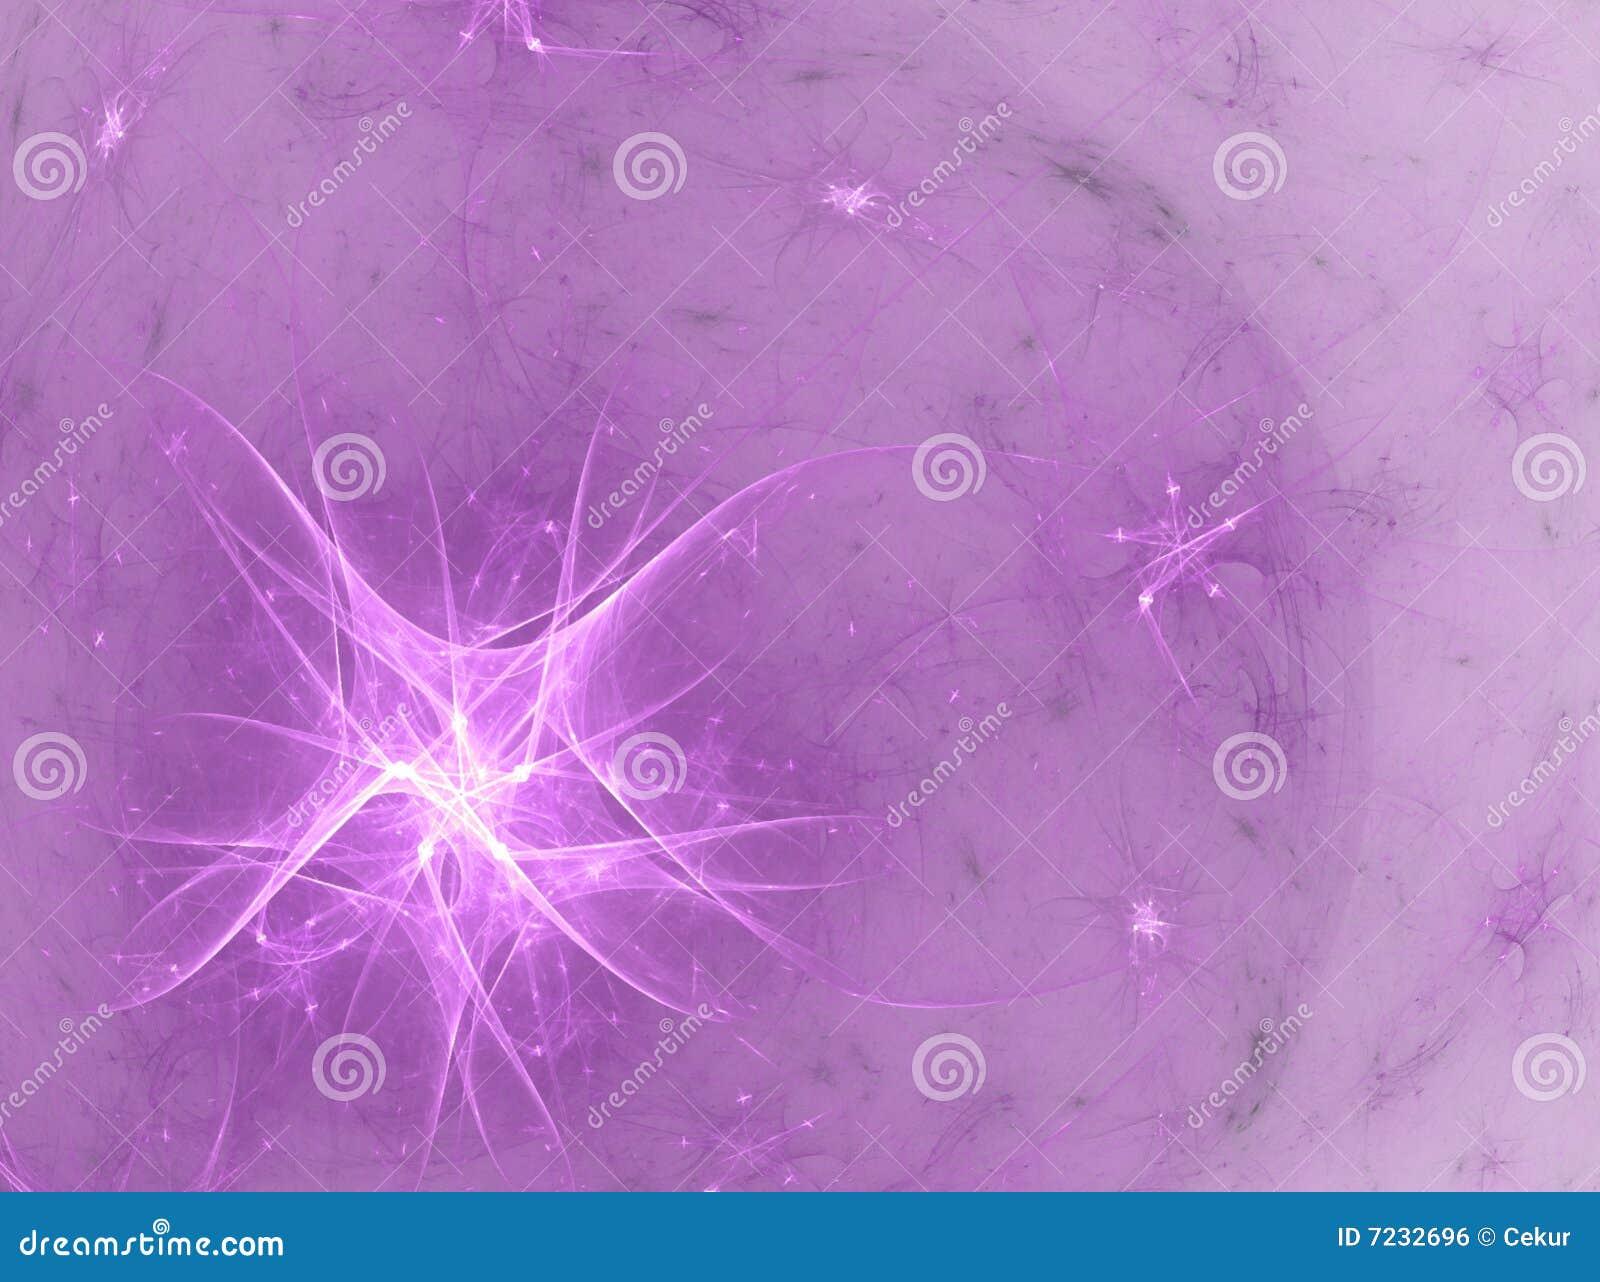 illustration fractal background clocks - photo #10